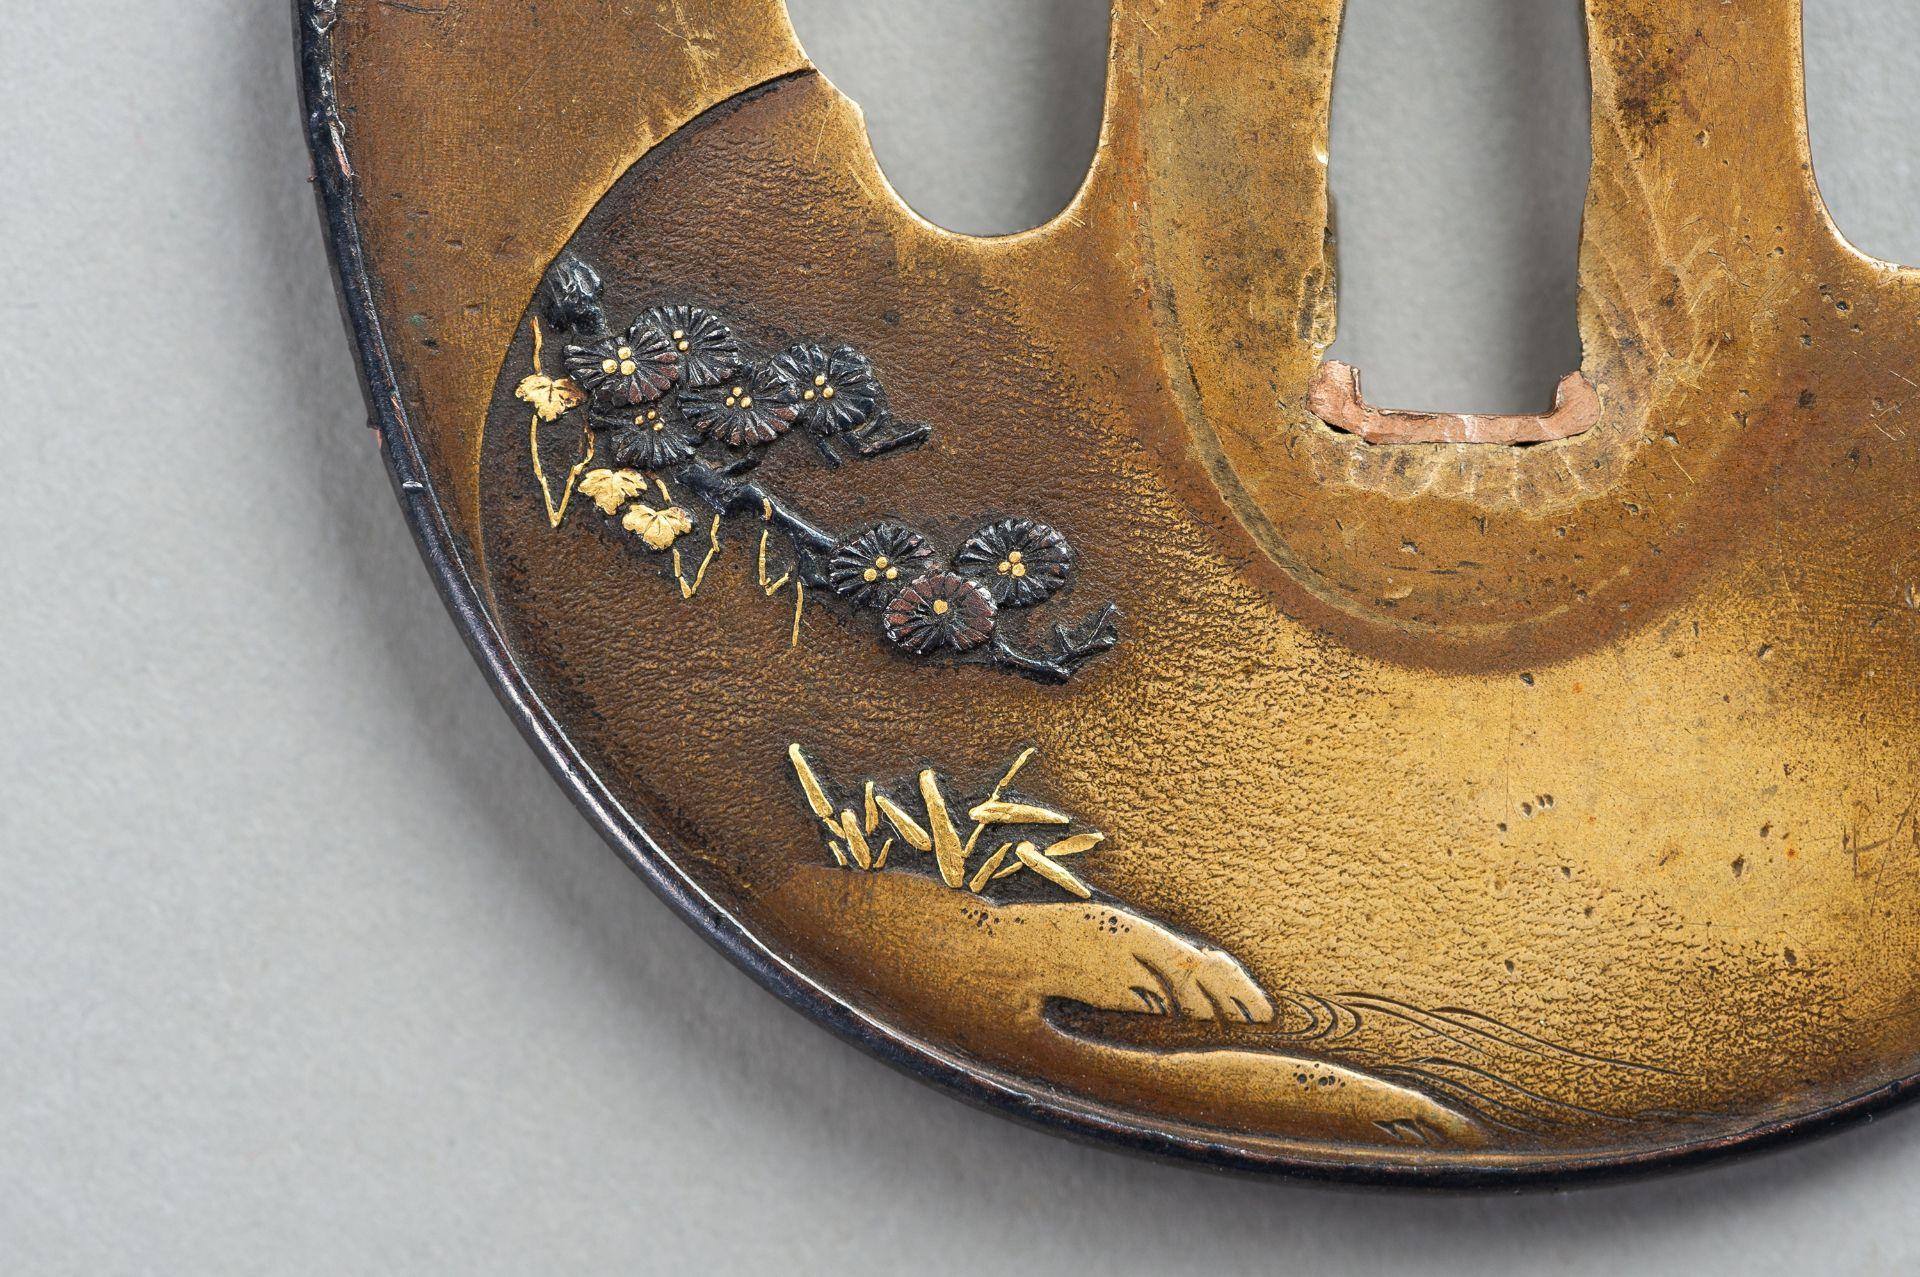 A SENTOKU TSUBA WITH A LANDSCAPE - Image 2 of 5